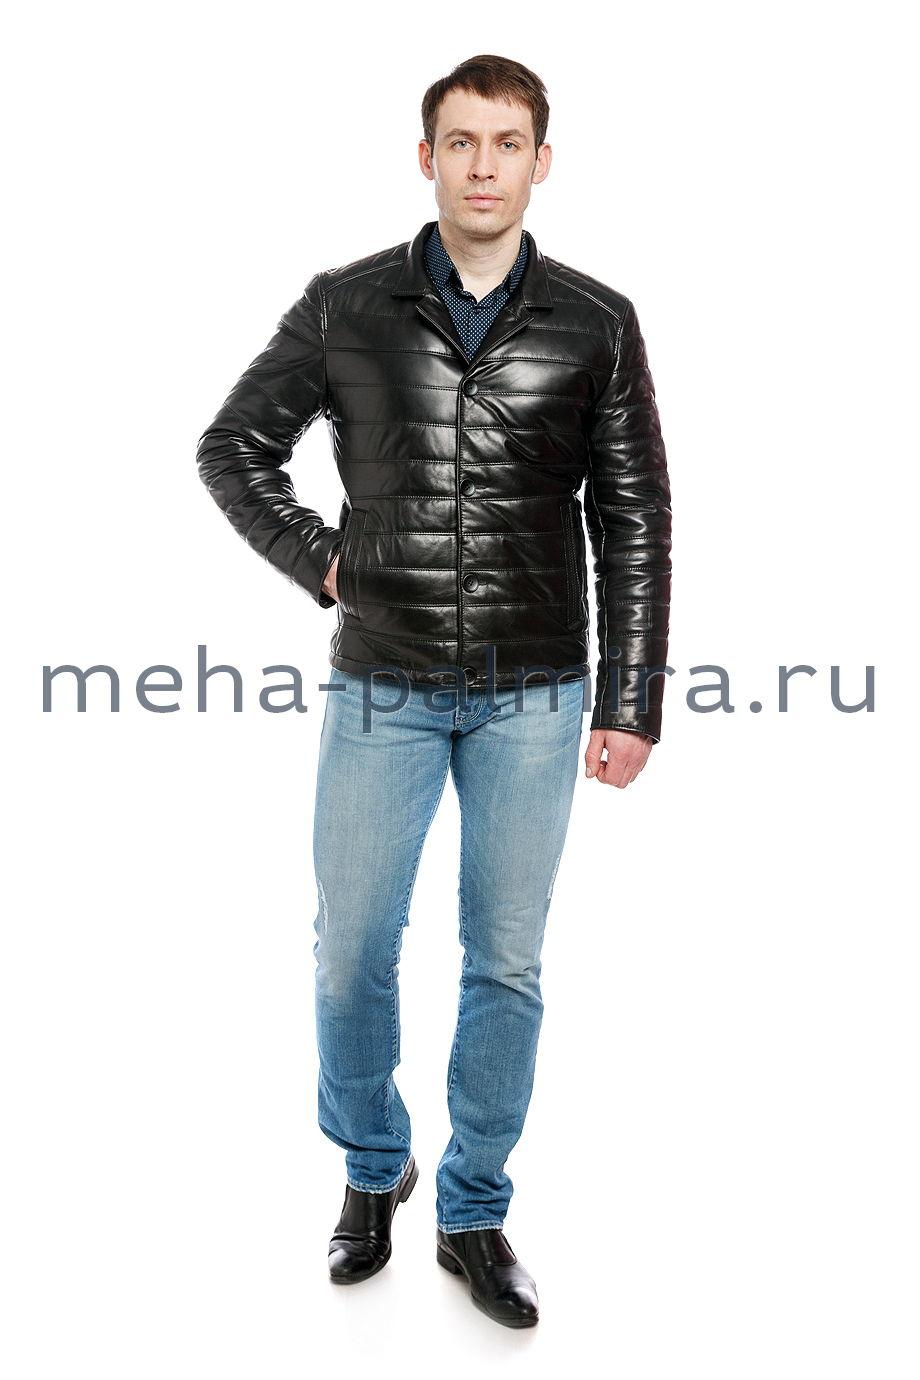 Осенняя кожаная куртка на пуговицах